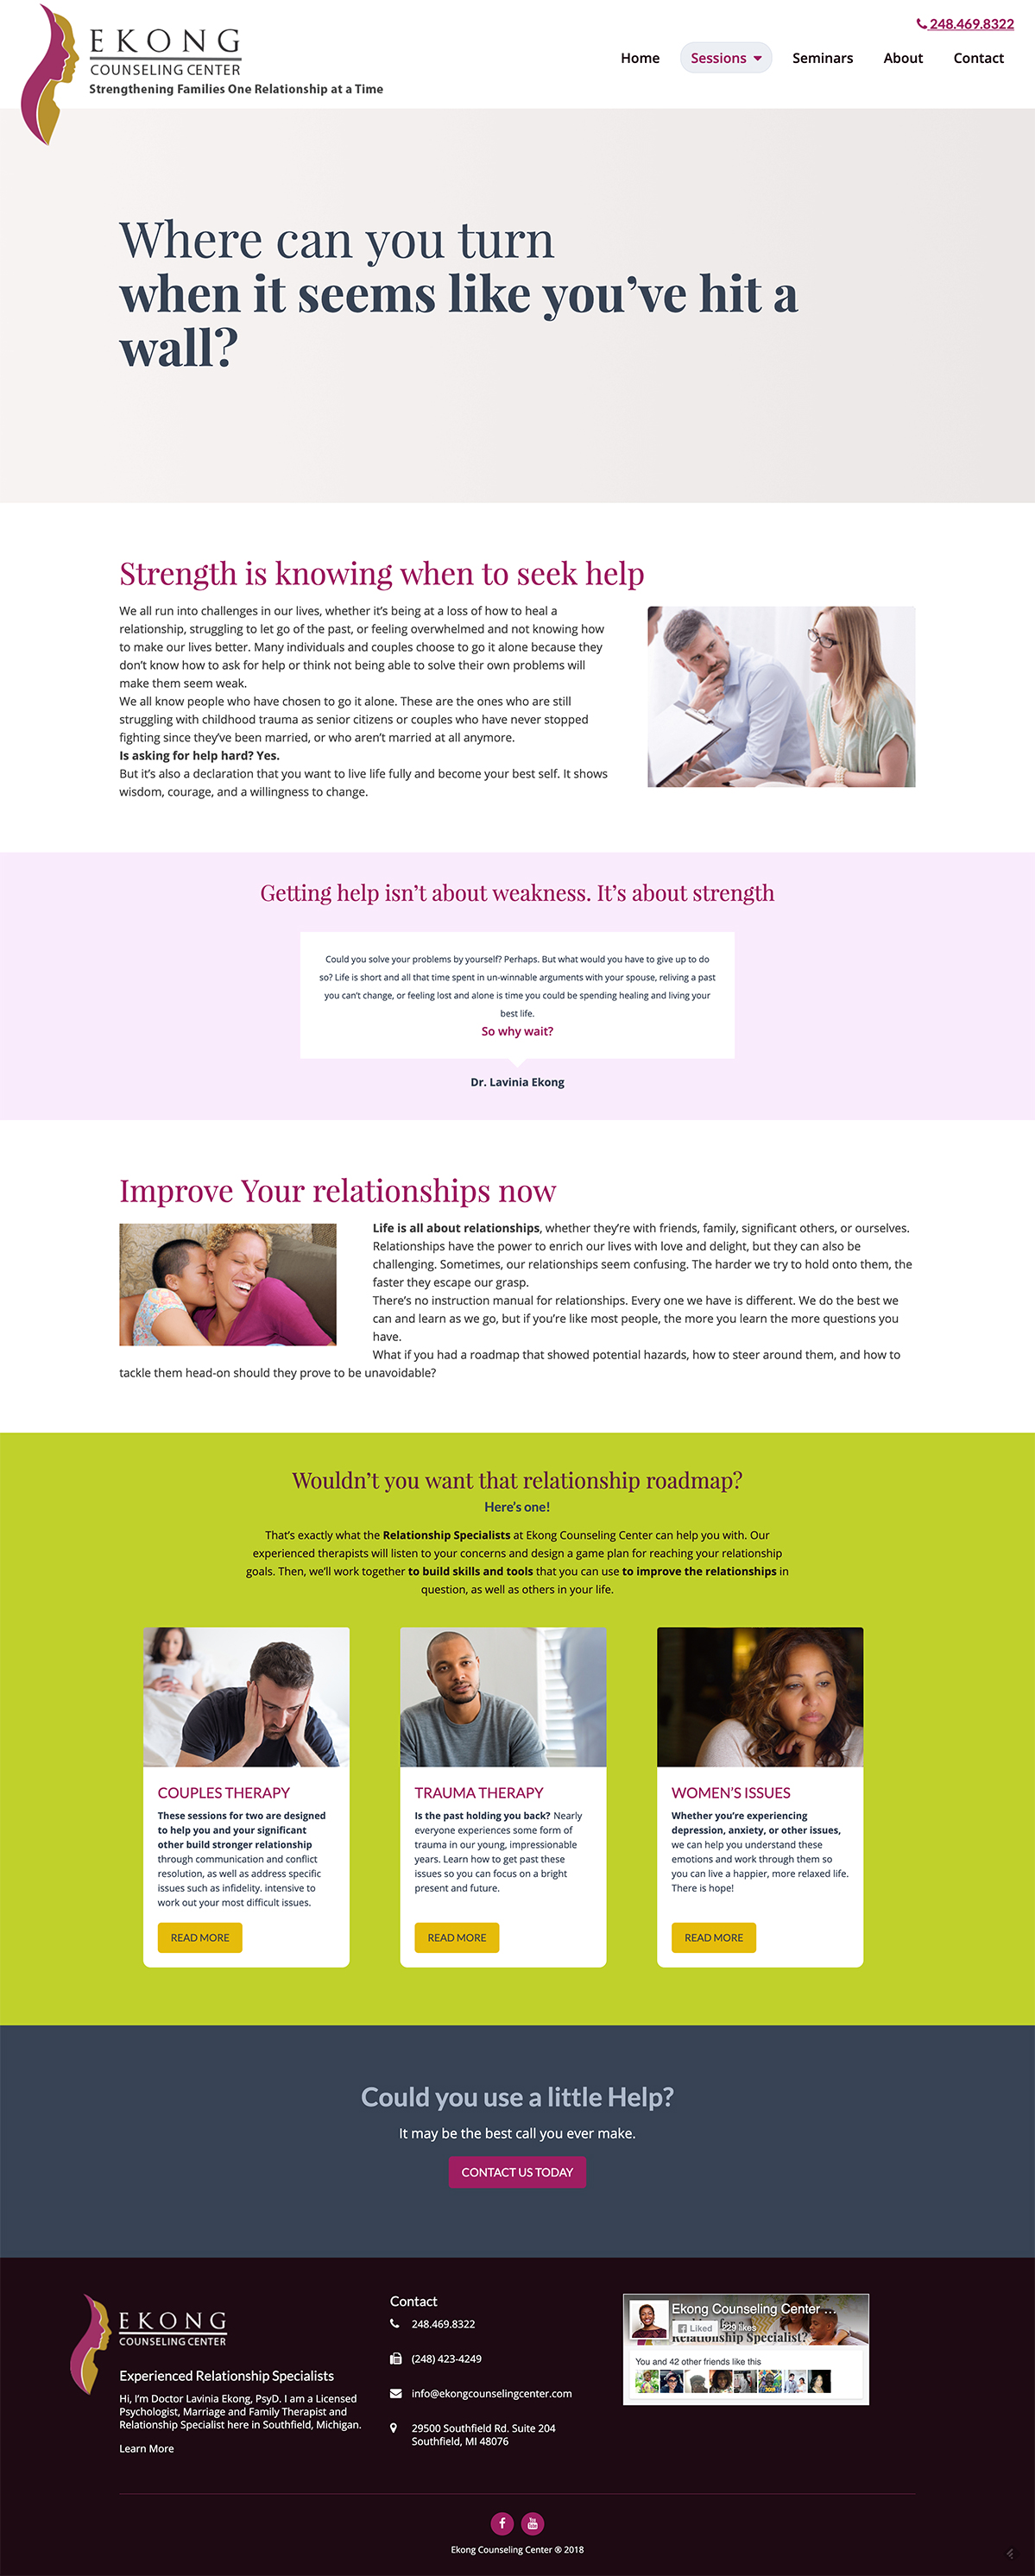 ekongcounselingcenter-services-page